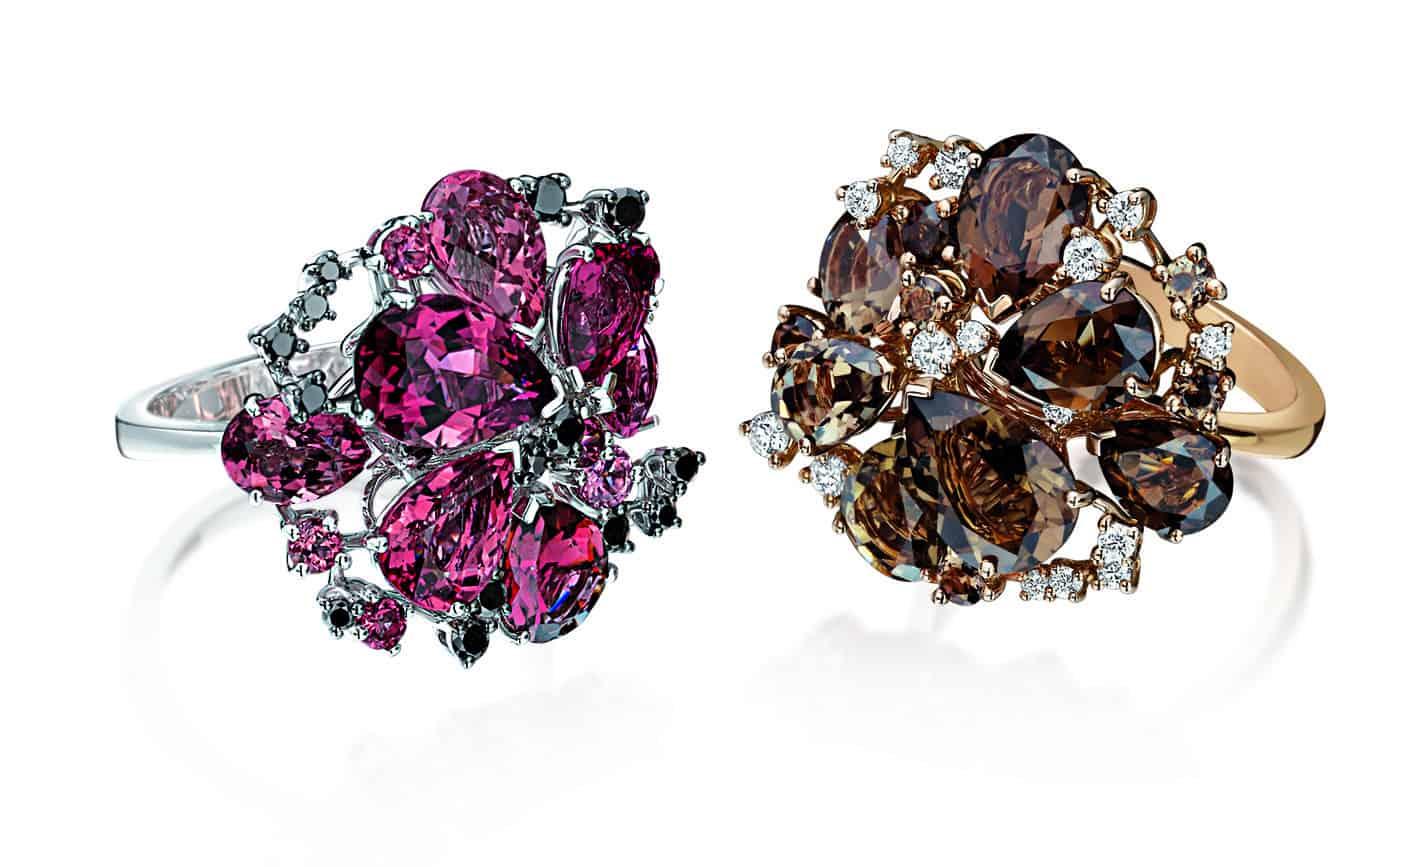 Bibigi: preziosi gioielli che nascono da creatività ed artigianalità